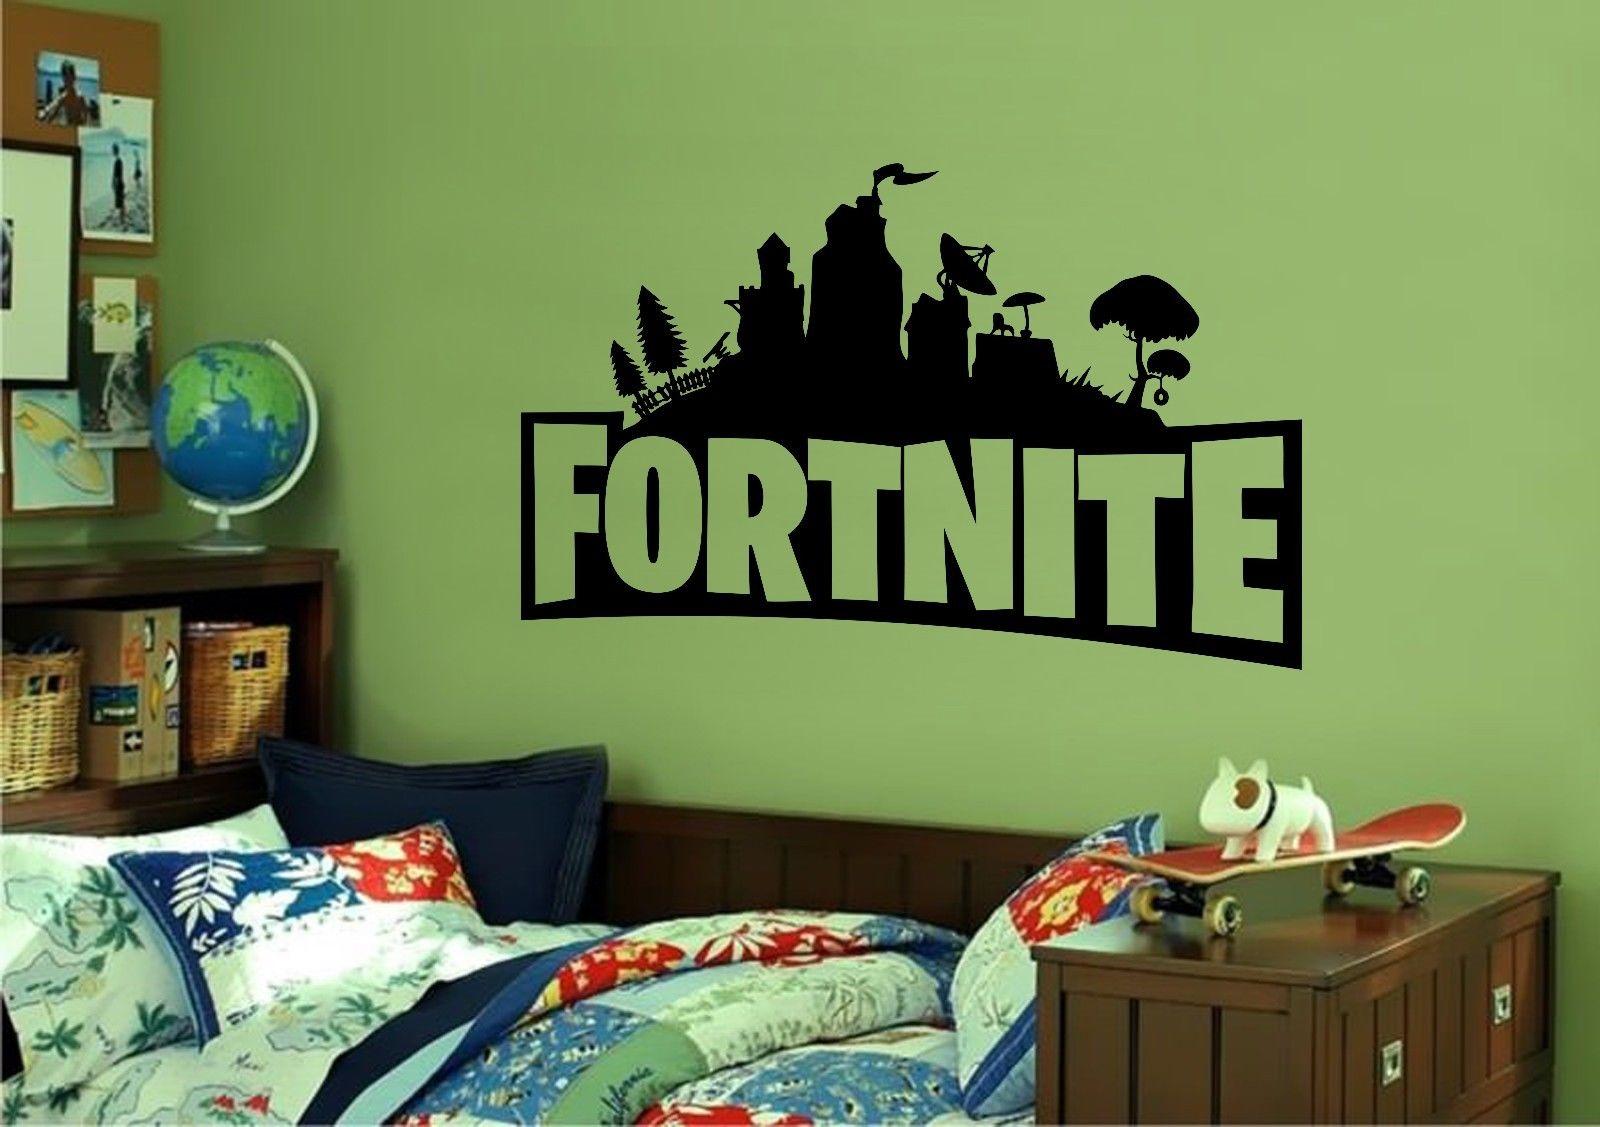 Fortnite Logo Wall Sticker Decal